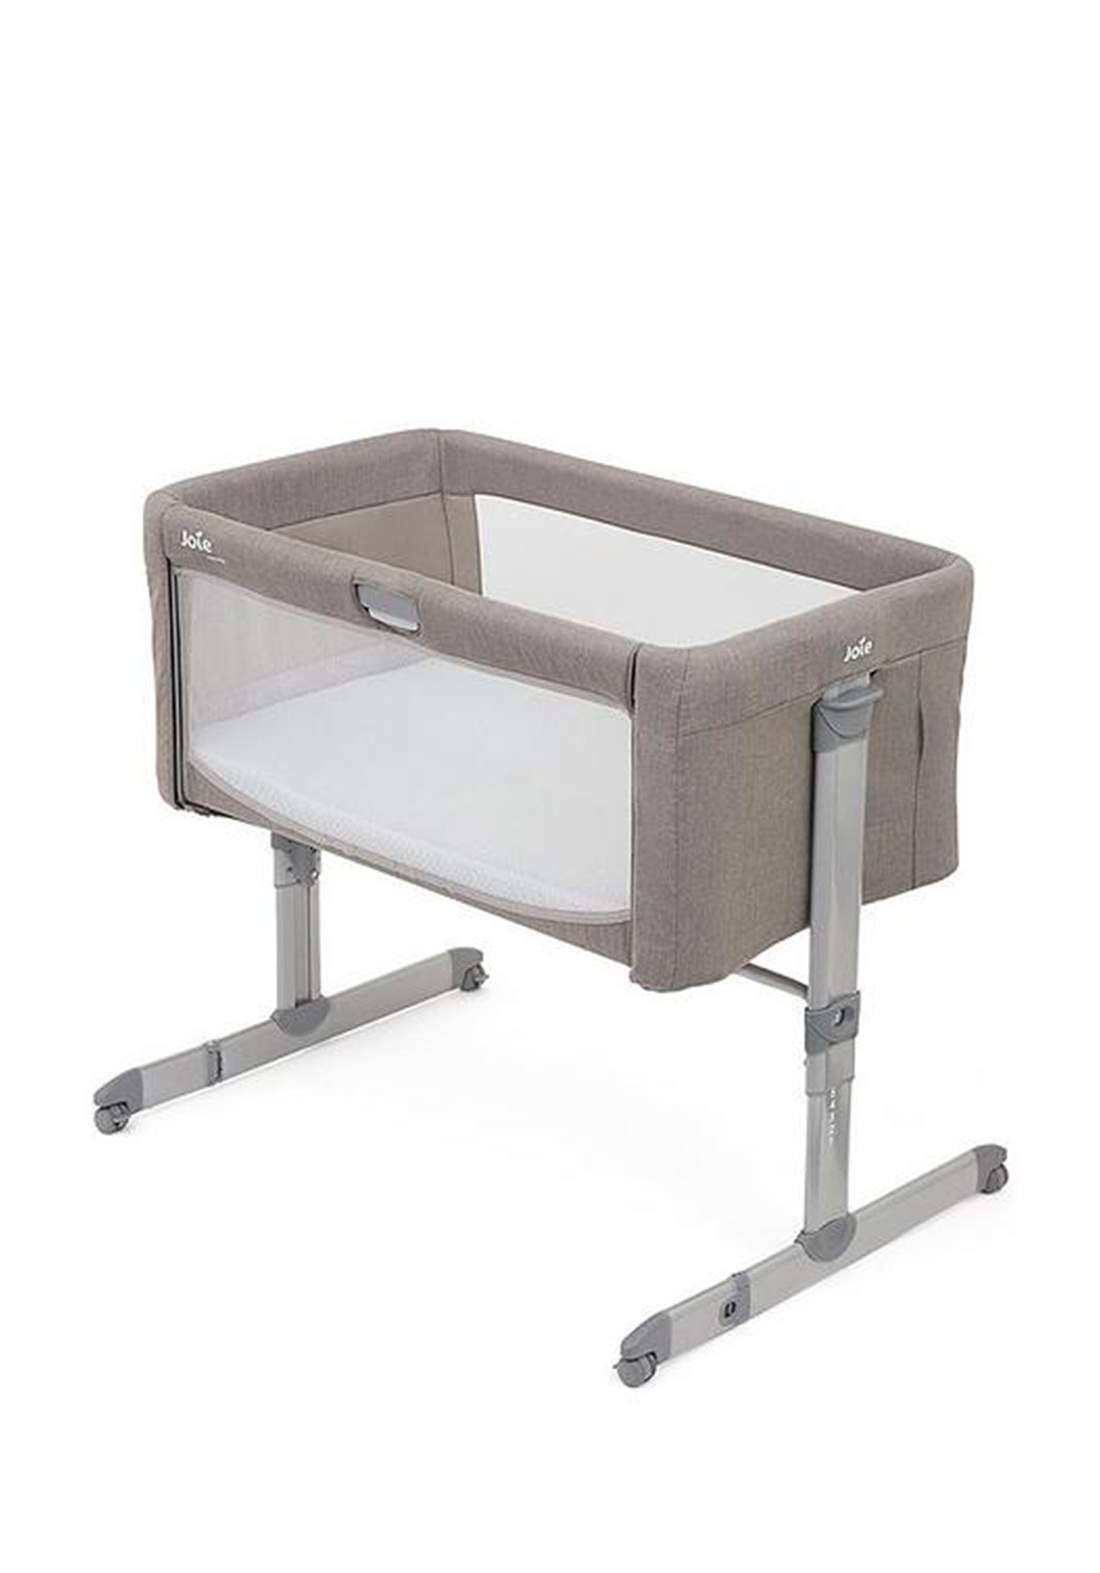 سرير نوم للاطفال 6 اشهر Joie Baby P1814BAWNT000R oomie 5 Piece Bedside Crib Nursery Bundle - Walnut